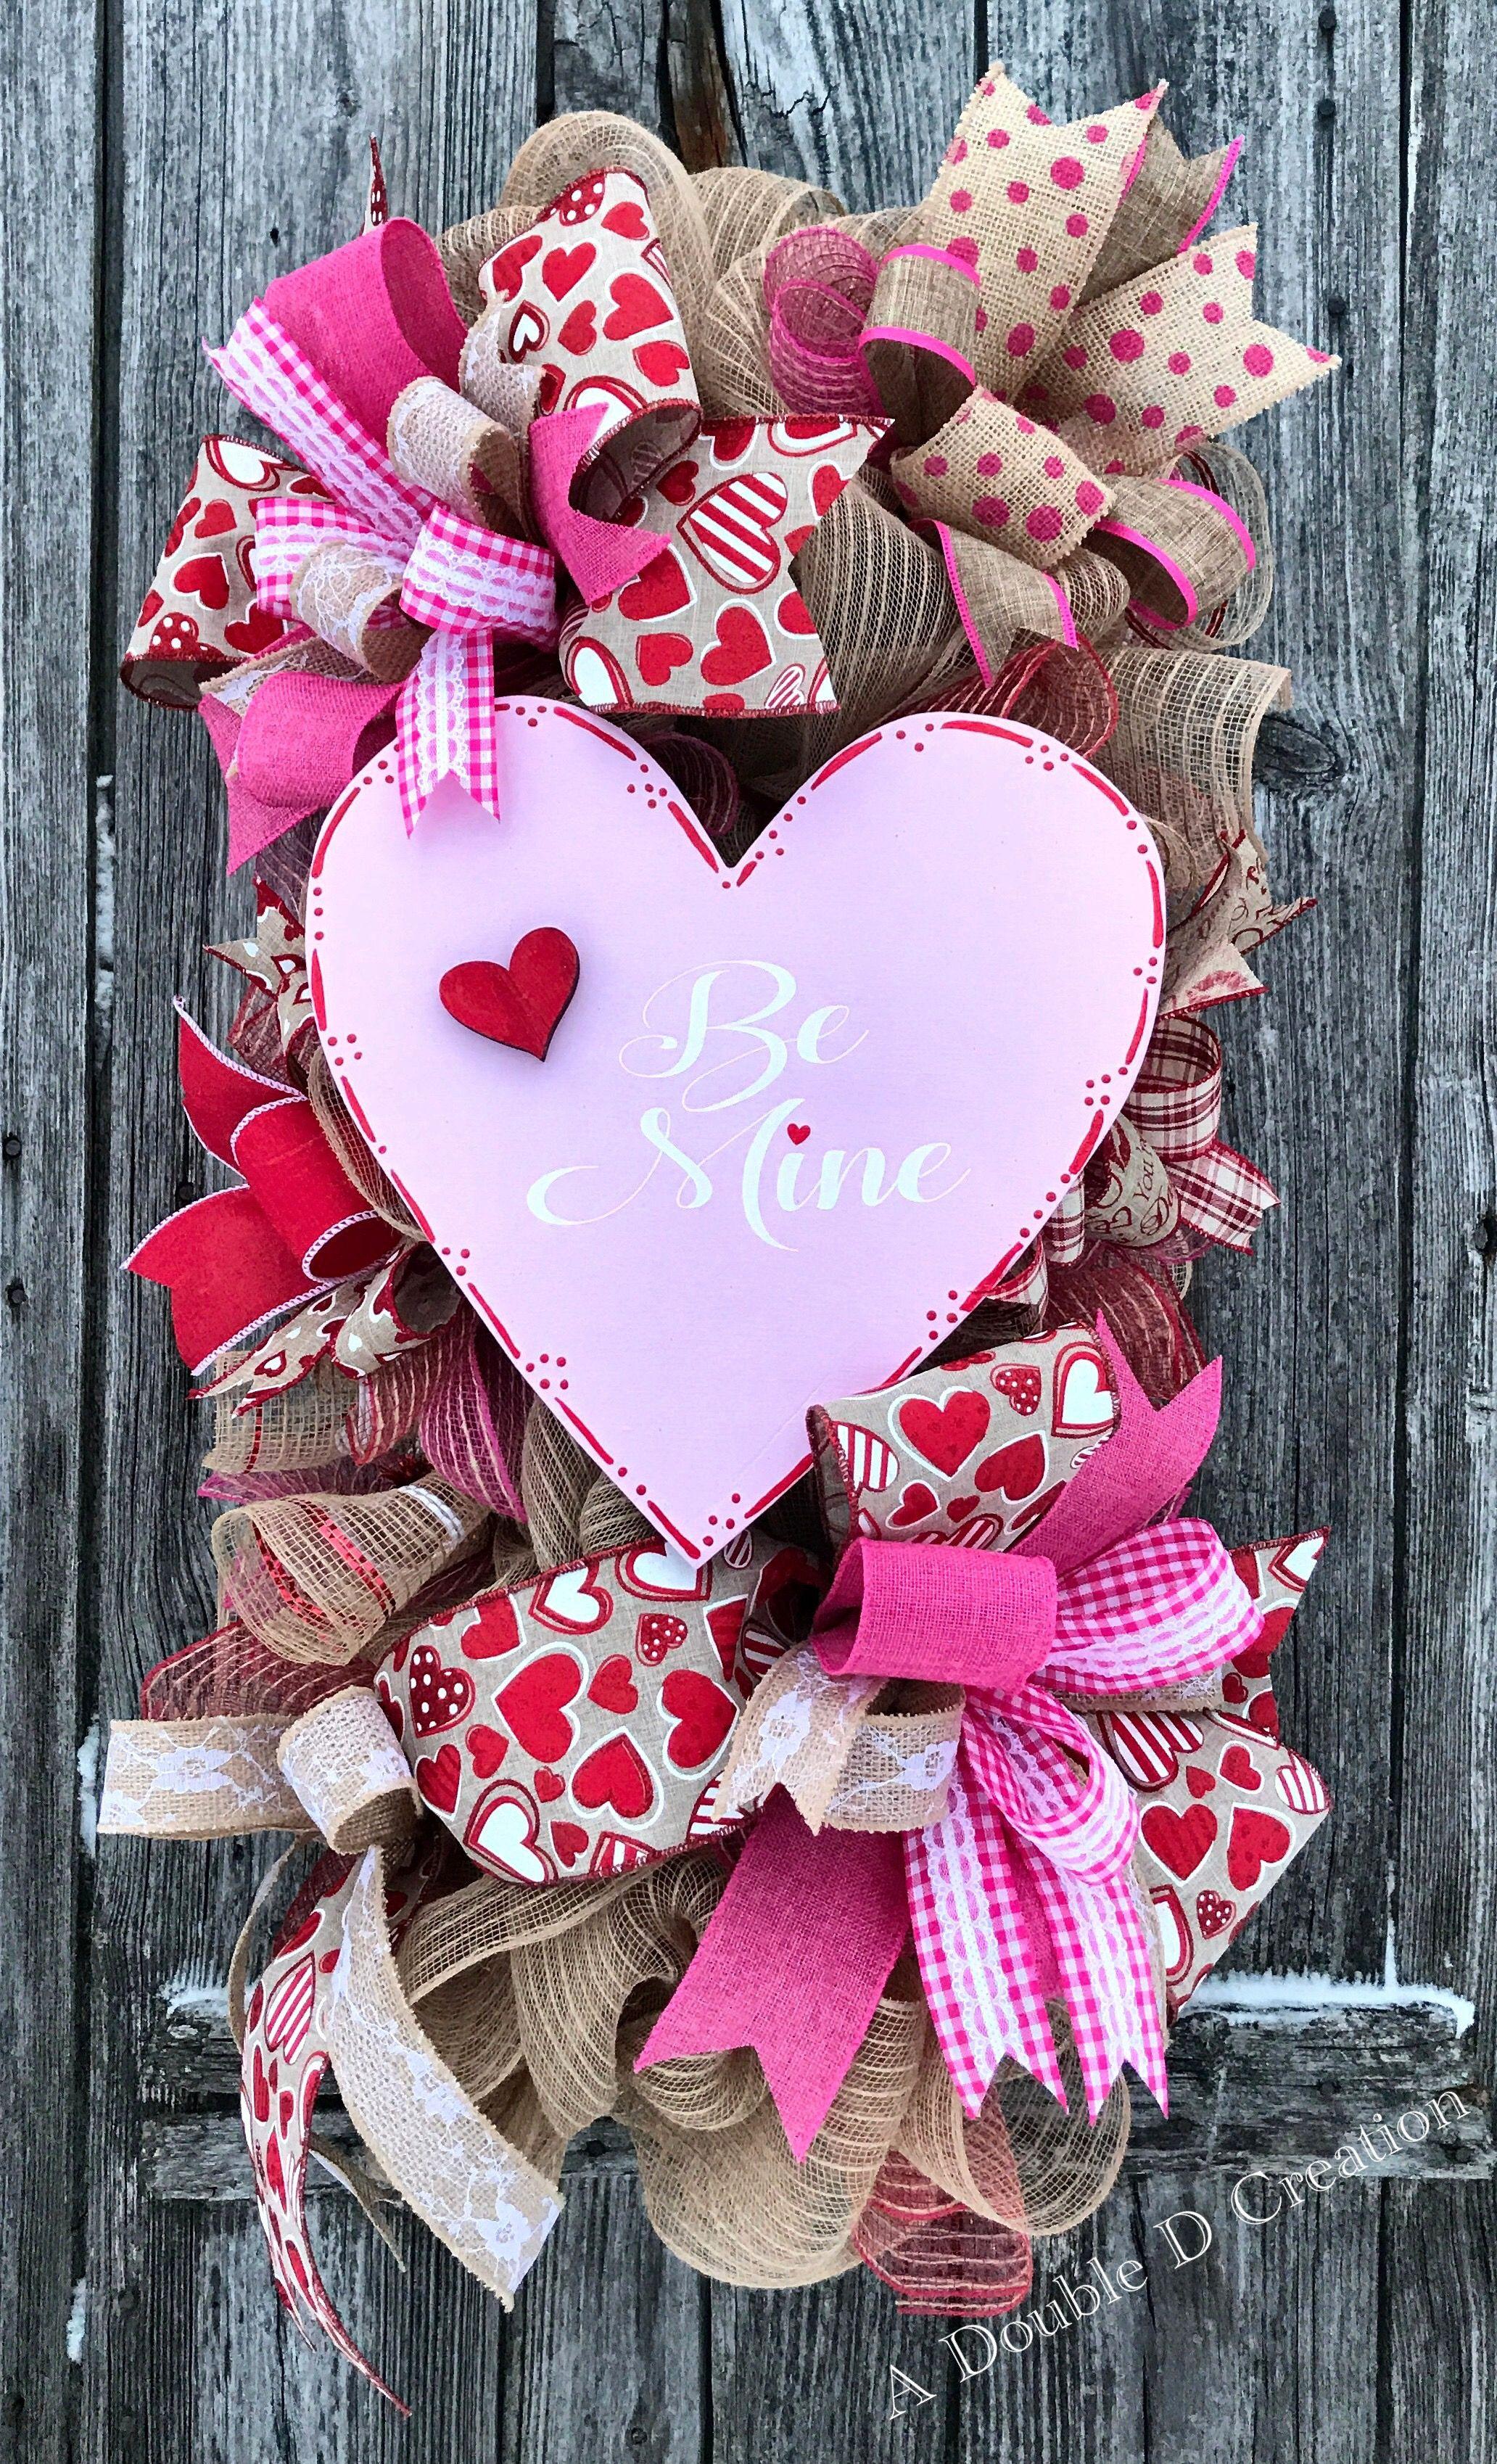 Adoubledcreation Etsy Valentines Diy Valentine Wreath Day Decorations Deco